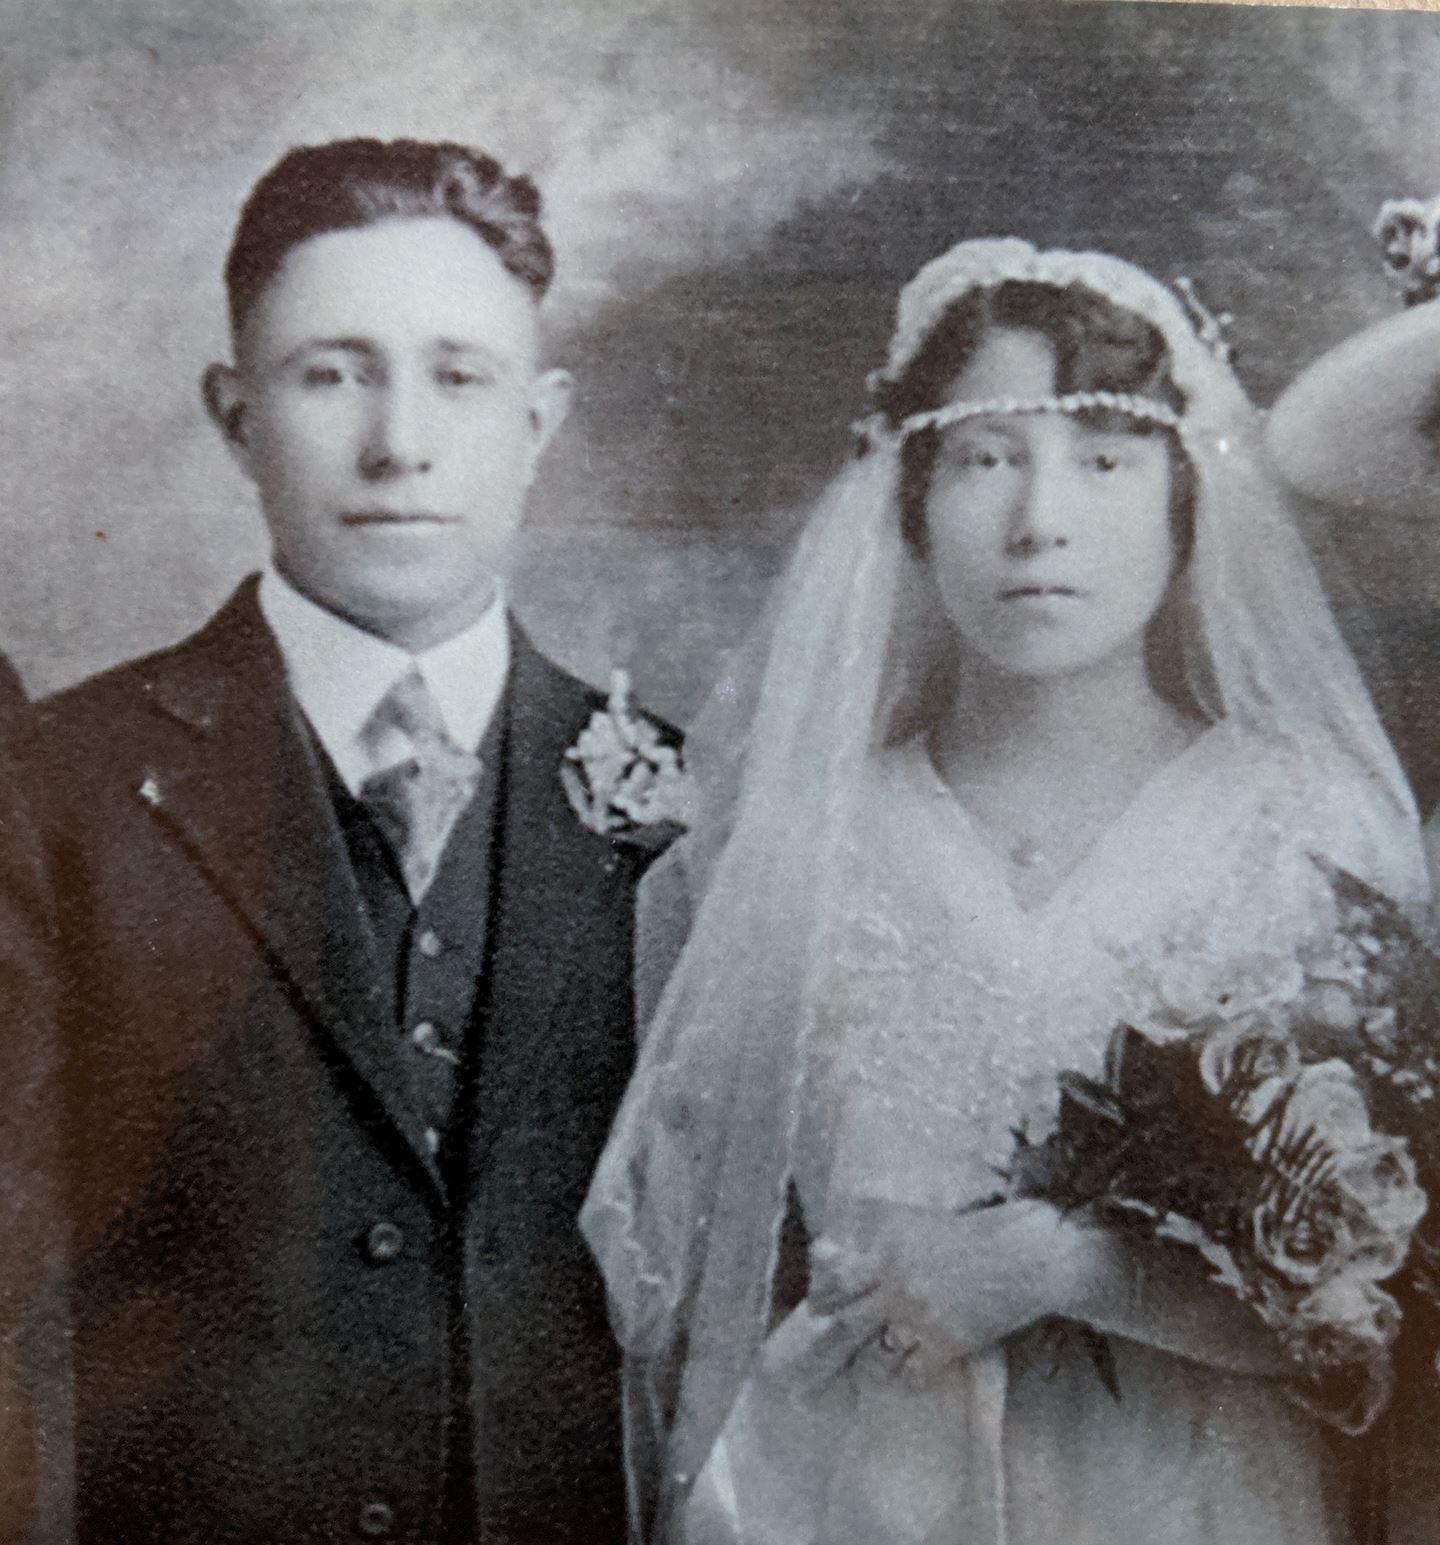 Wedding portrait Santiago and Rose Lueras